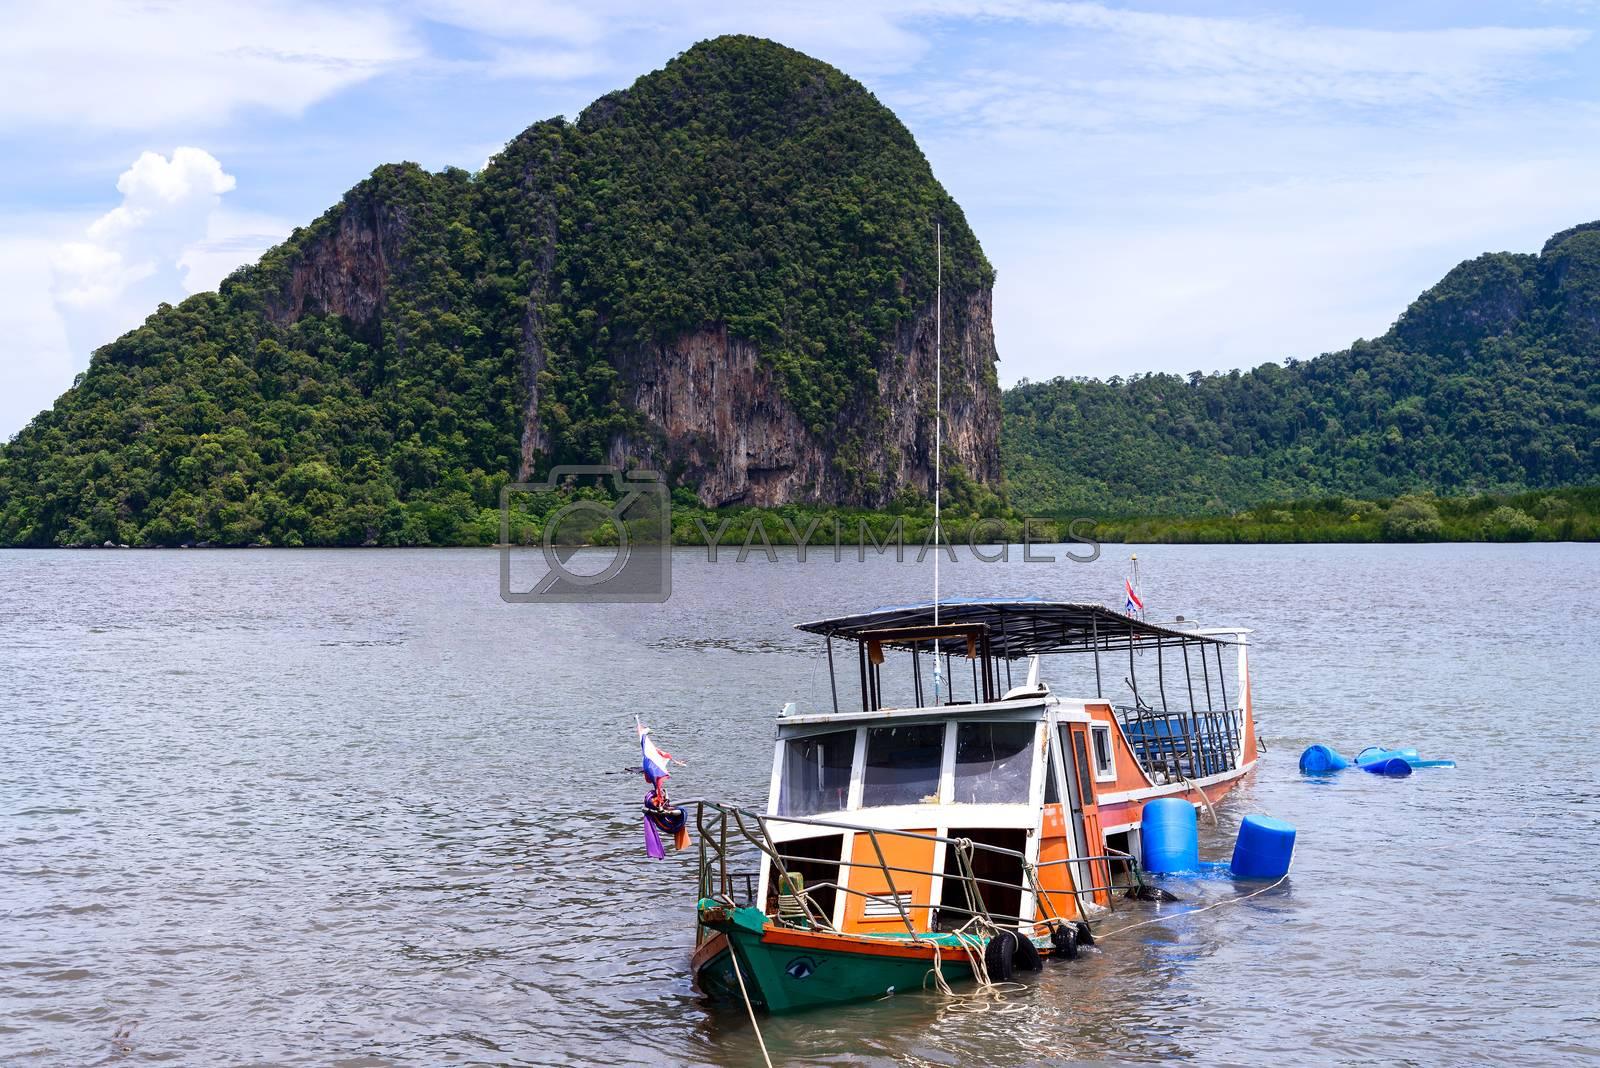 The passenger boat sank at Trang province ,Thailand  by jakgree